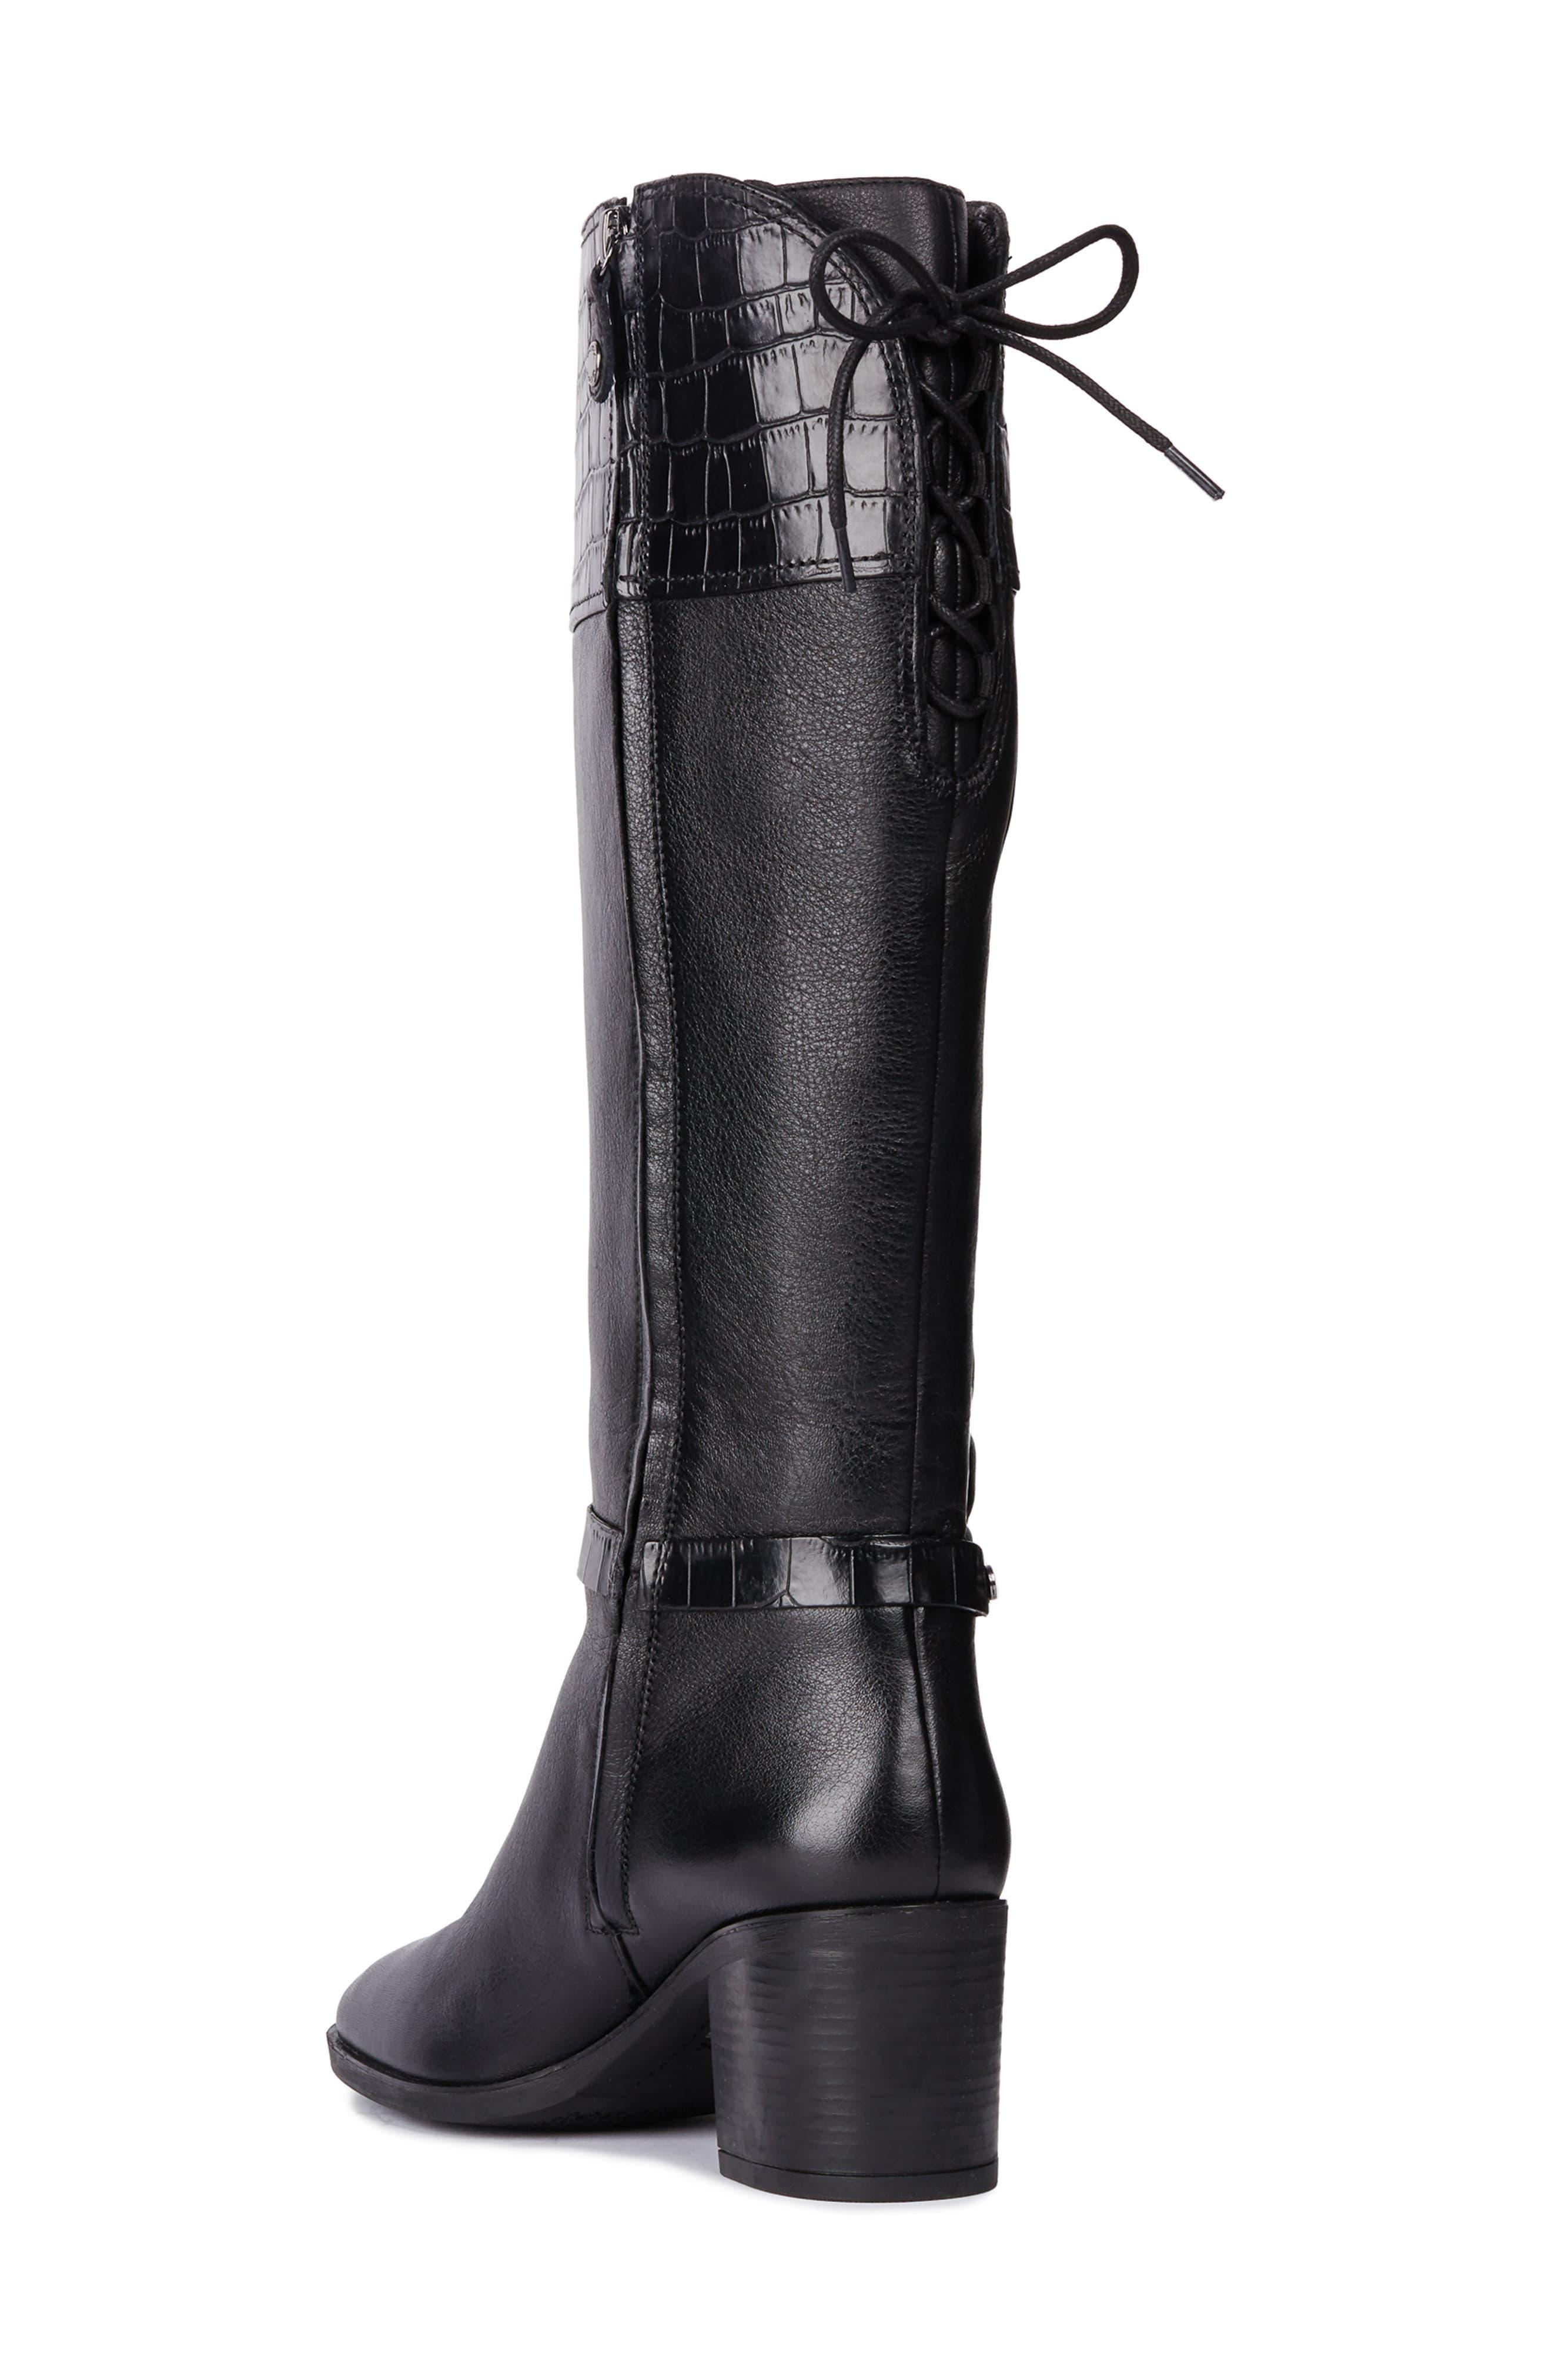 Glynna Knee High Boot,                             Alternate thumbnail 2, color,                             BLACK/ BLACK LEATHER